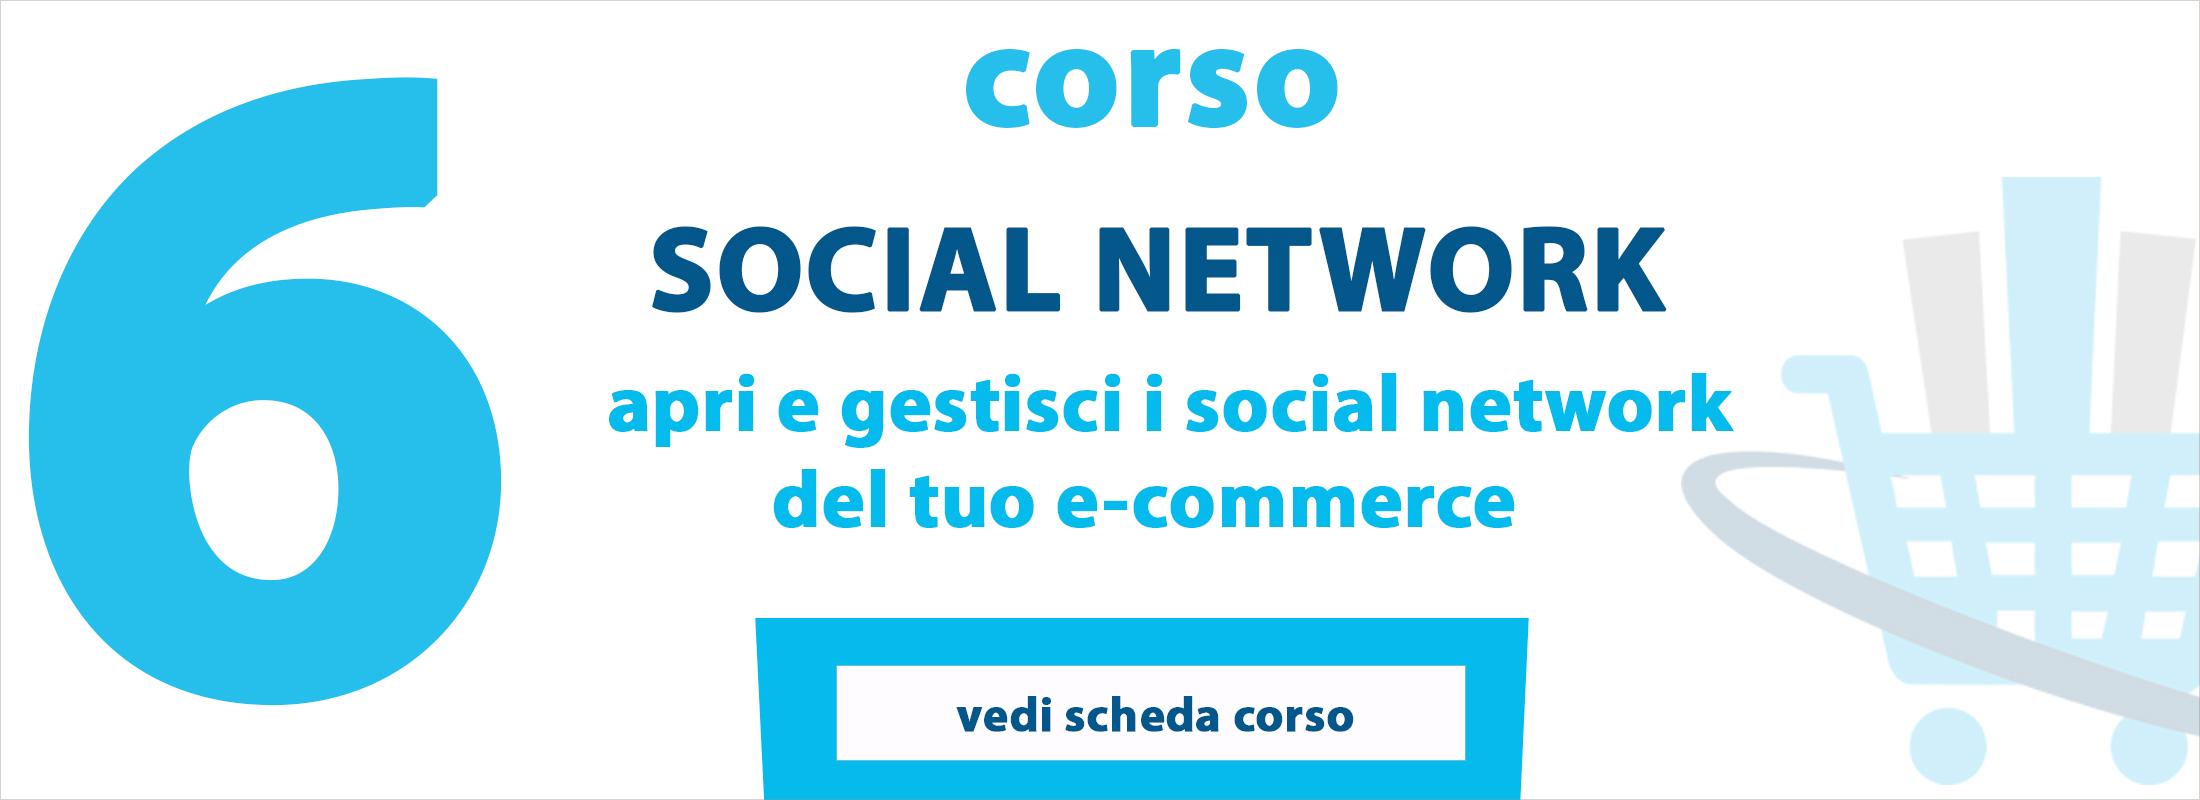 corso6socialnetworkecommerce